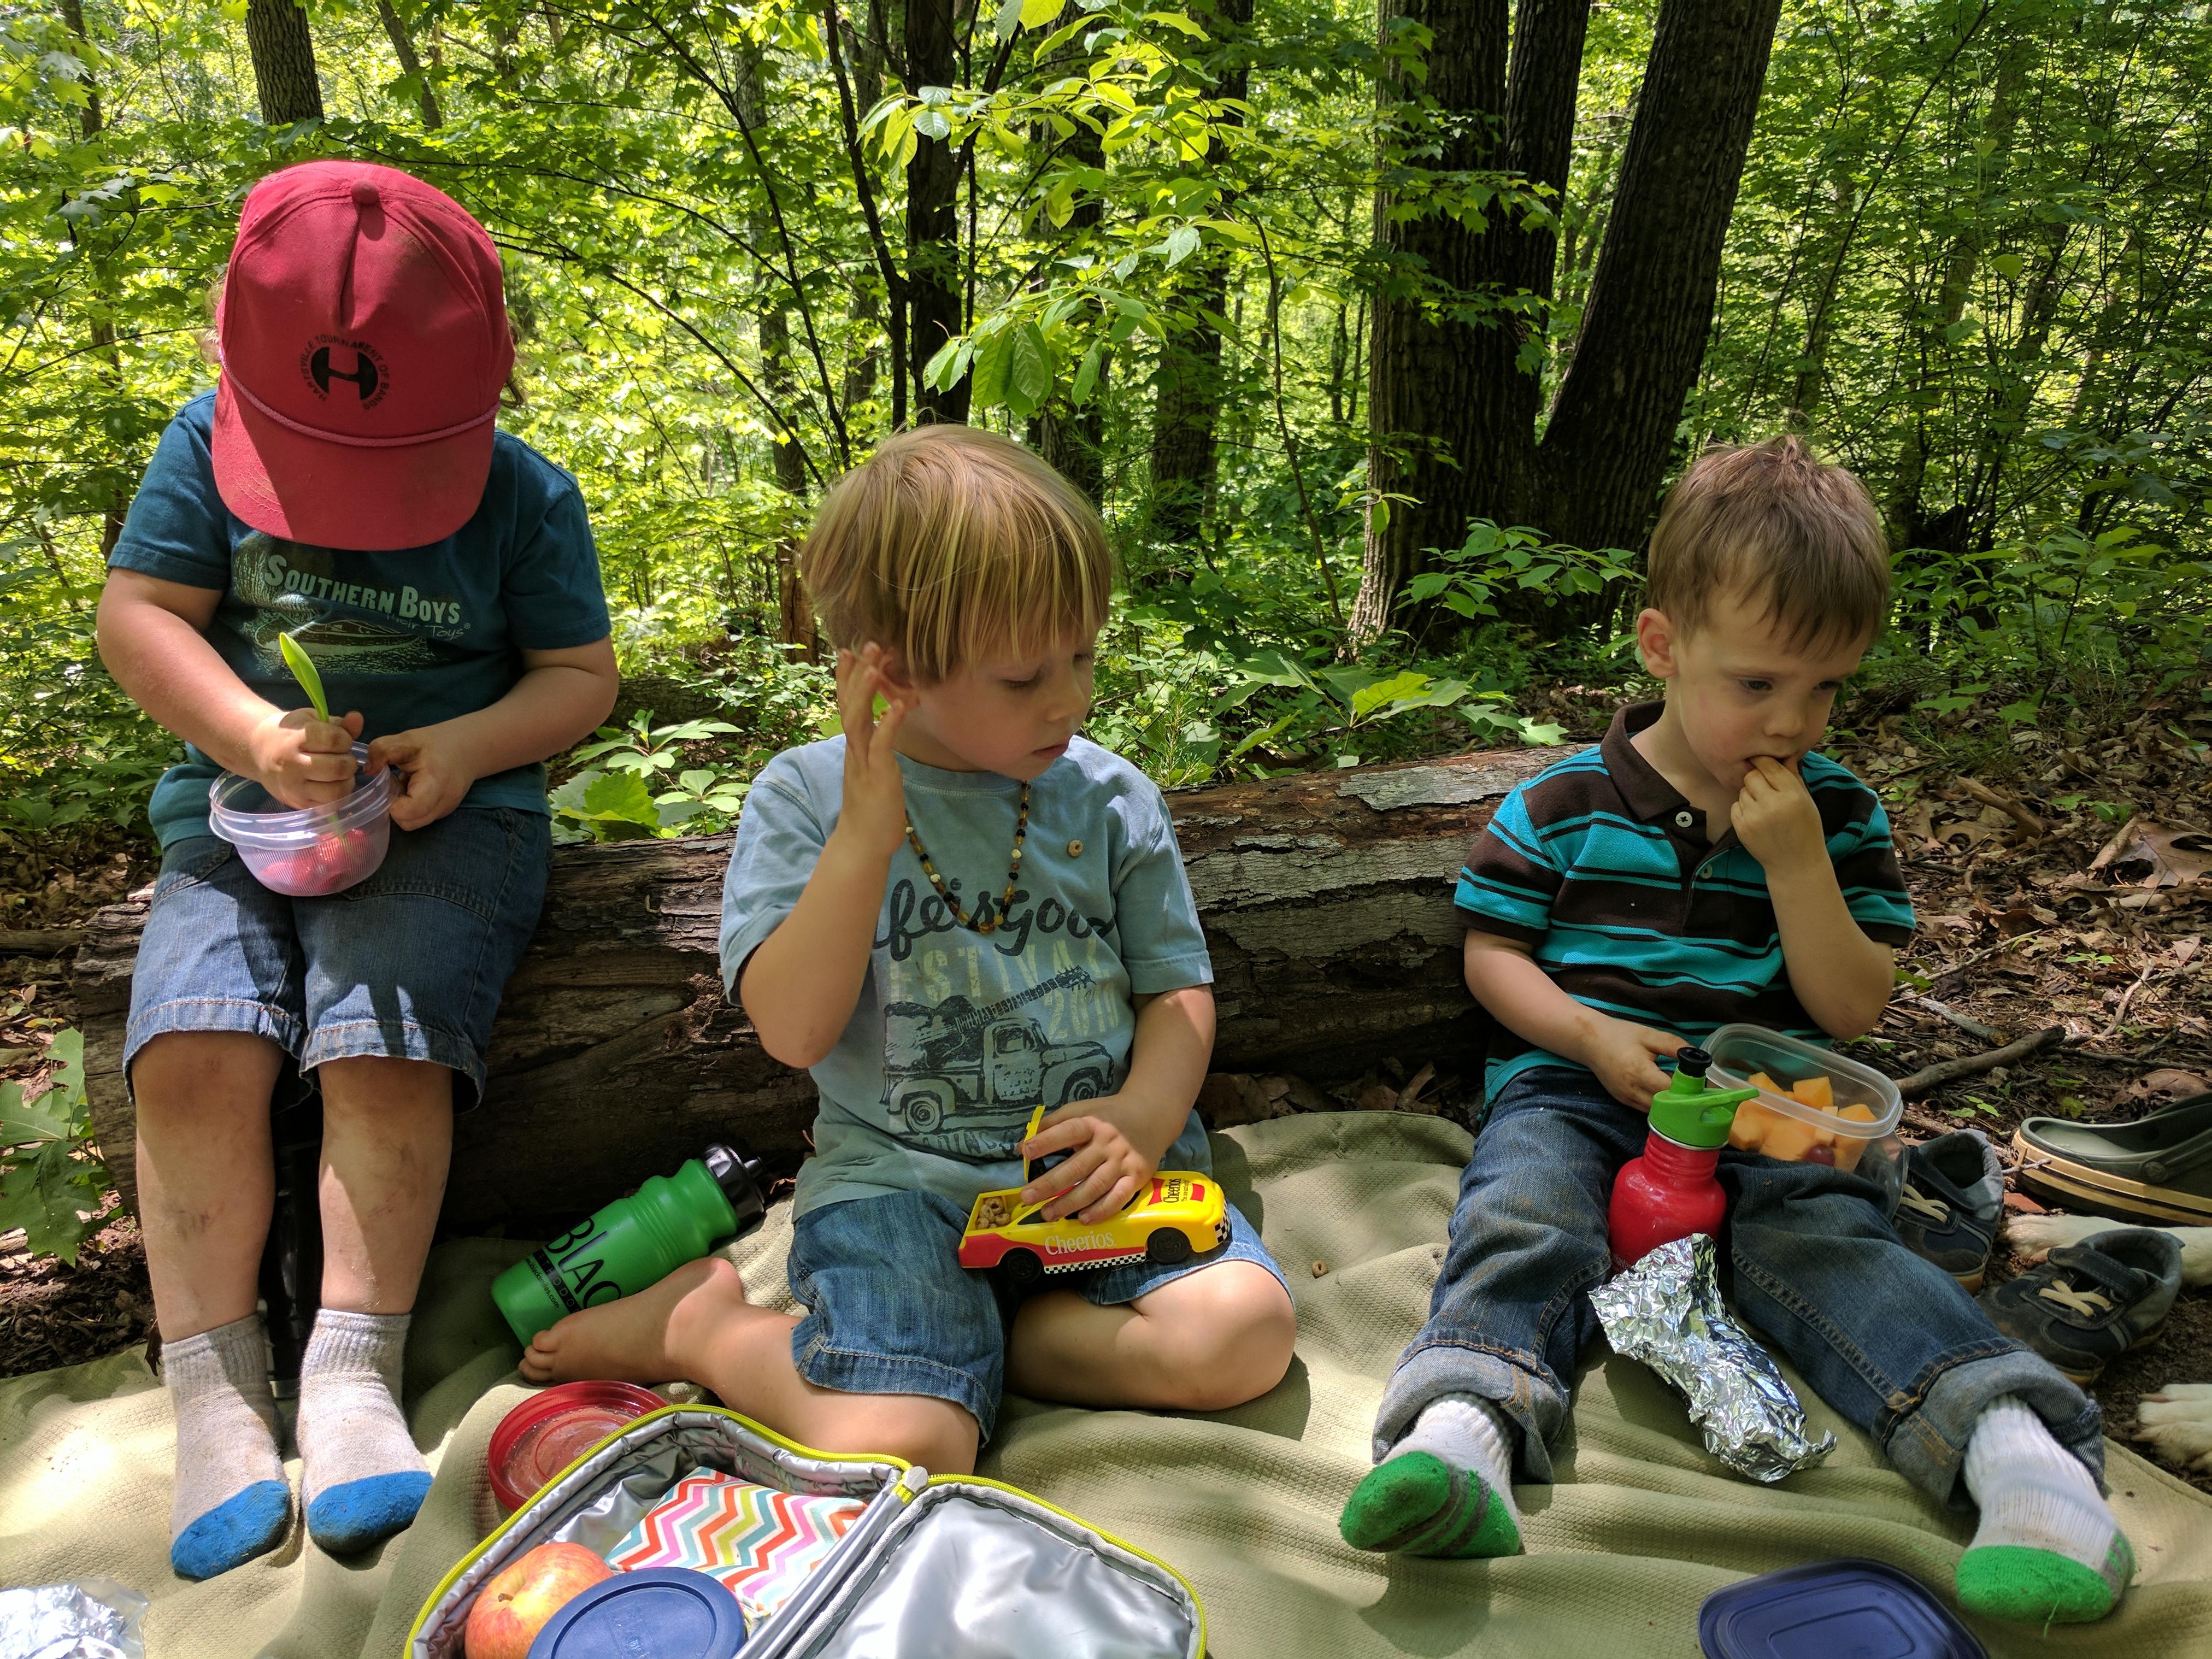 Ashevillefarmstead-kids-forest-lunch-explorers